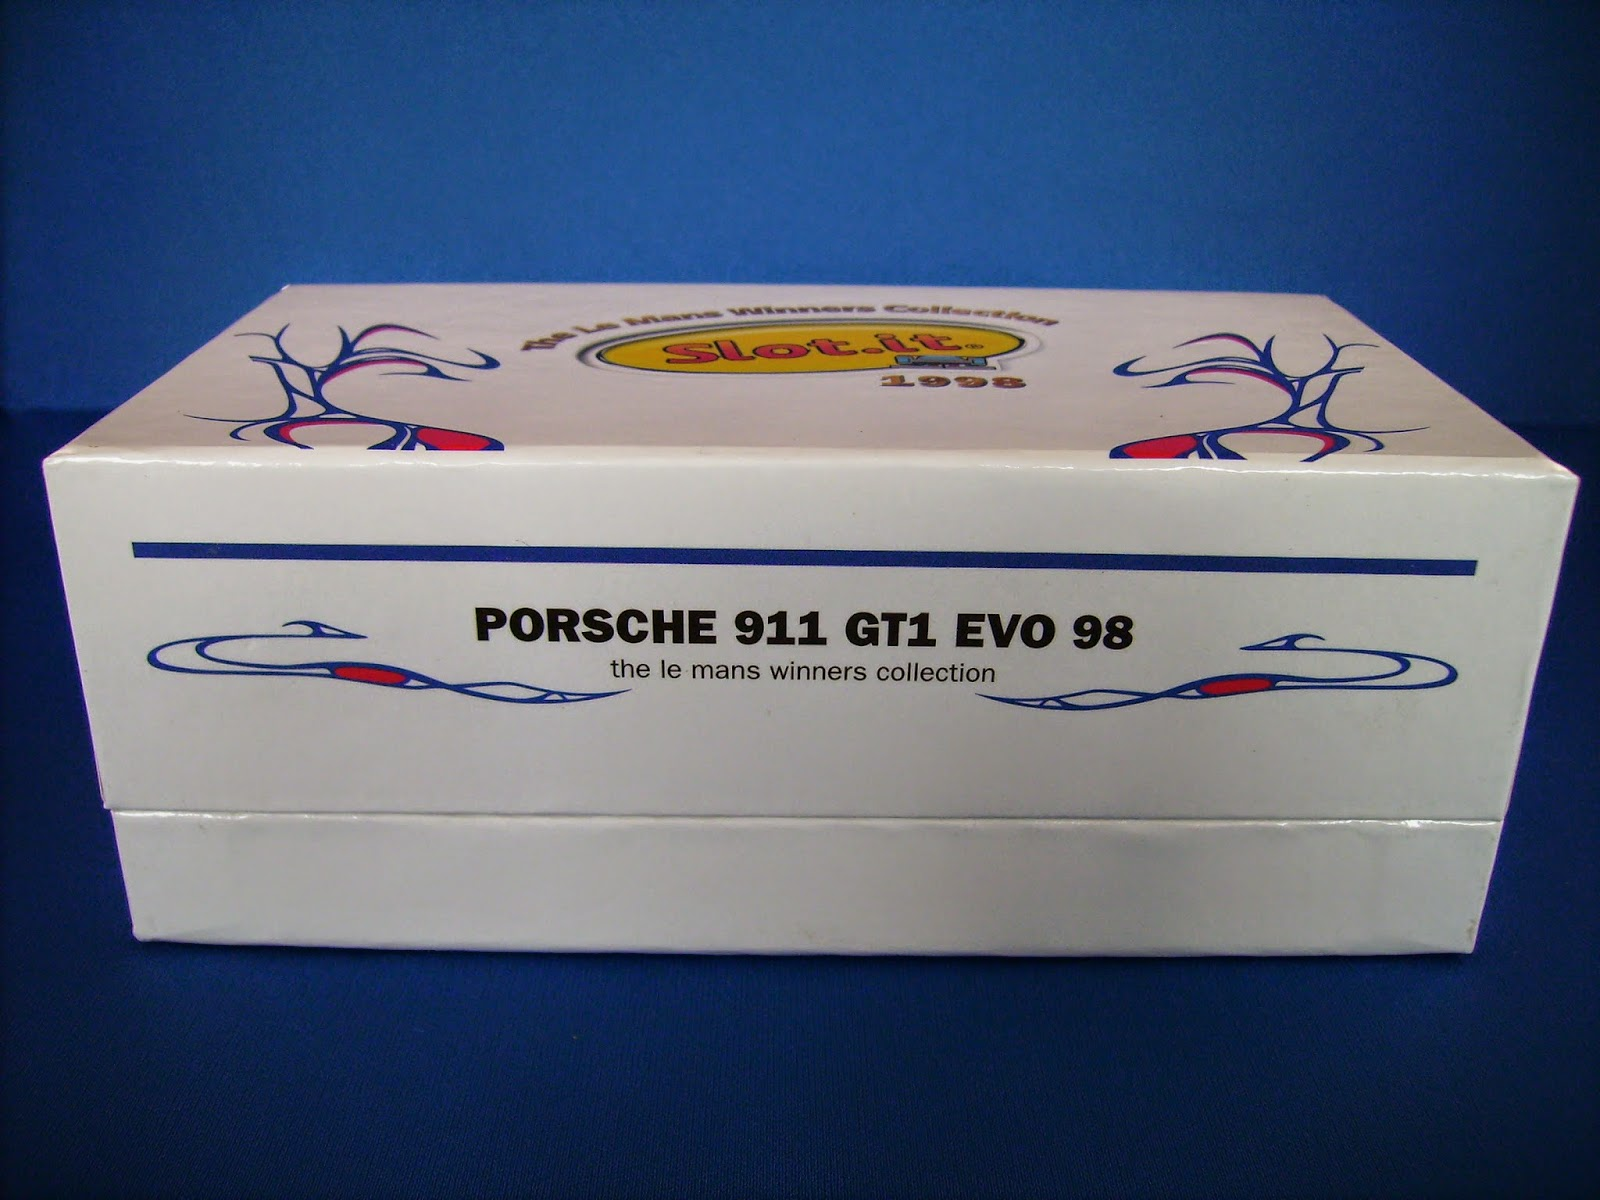 Porsche+911+GT1+EVO+-+Slot.it++001 Fascinating Porsche 911 Gt1 Evo 98 Slot It Cars Trend